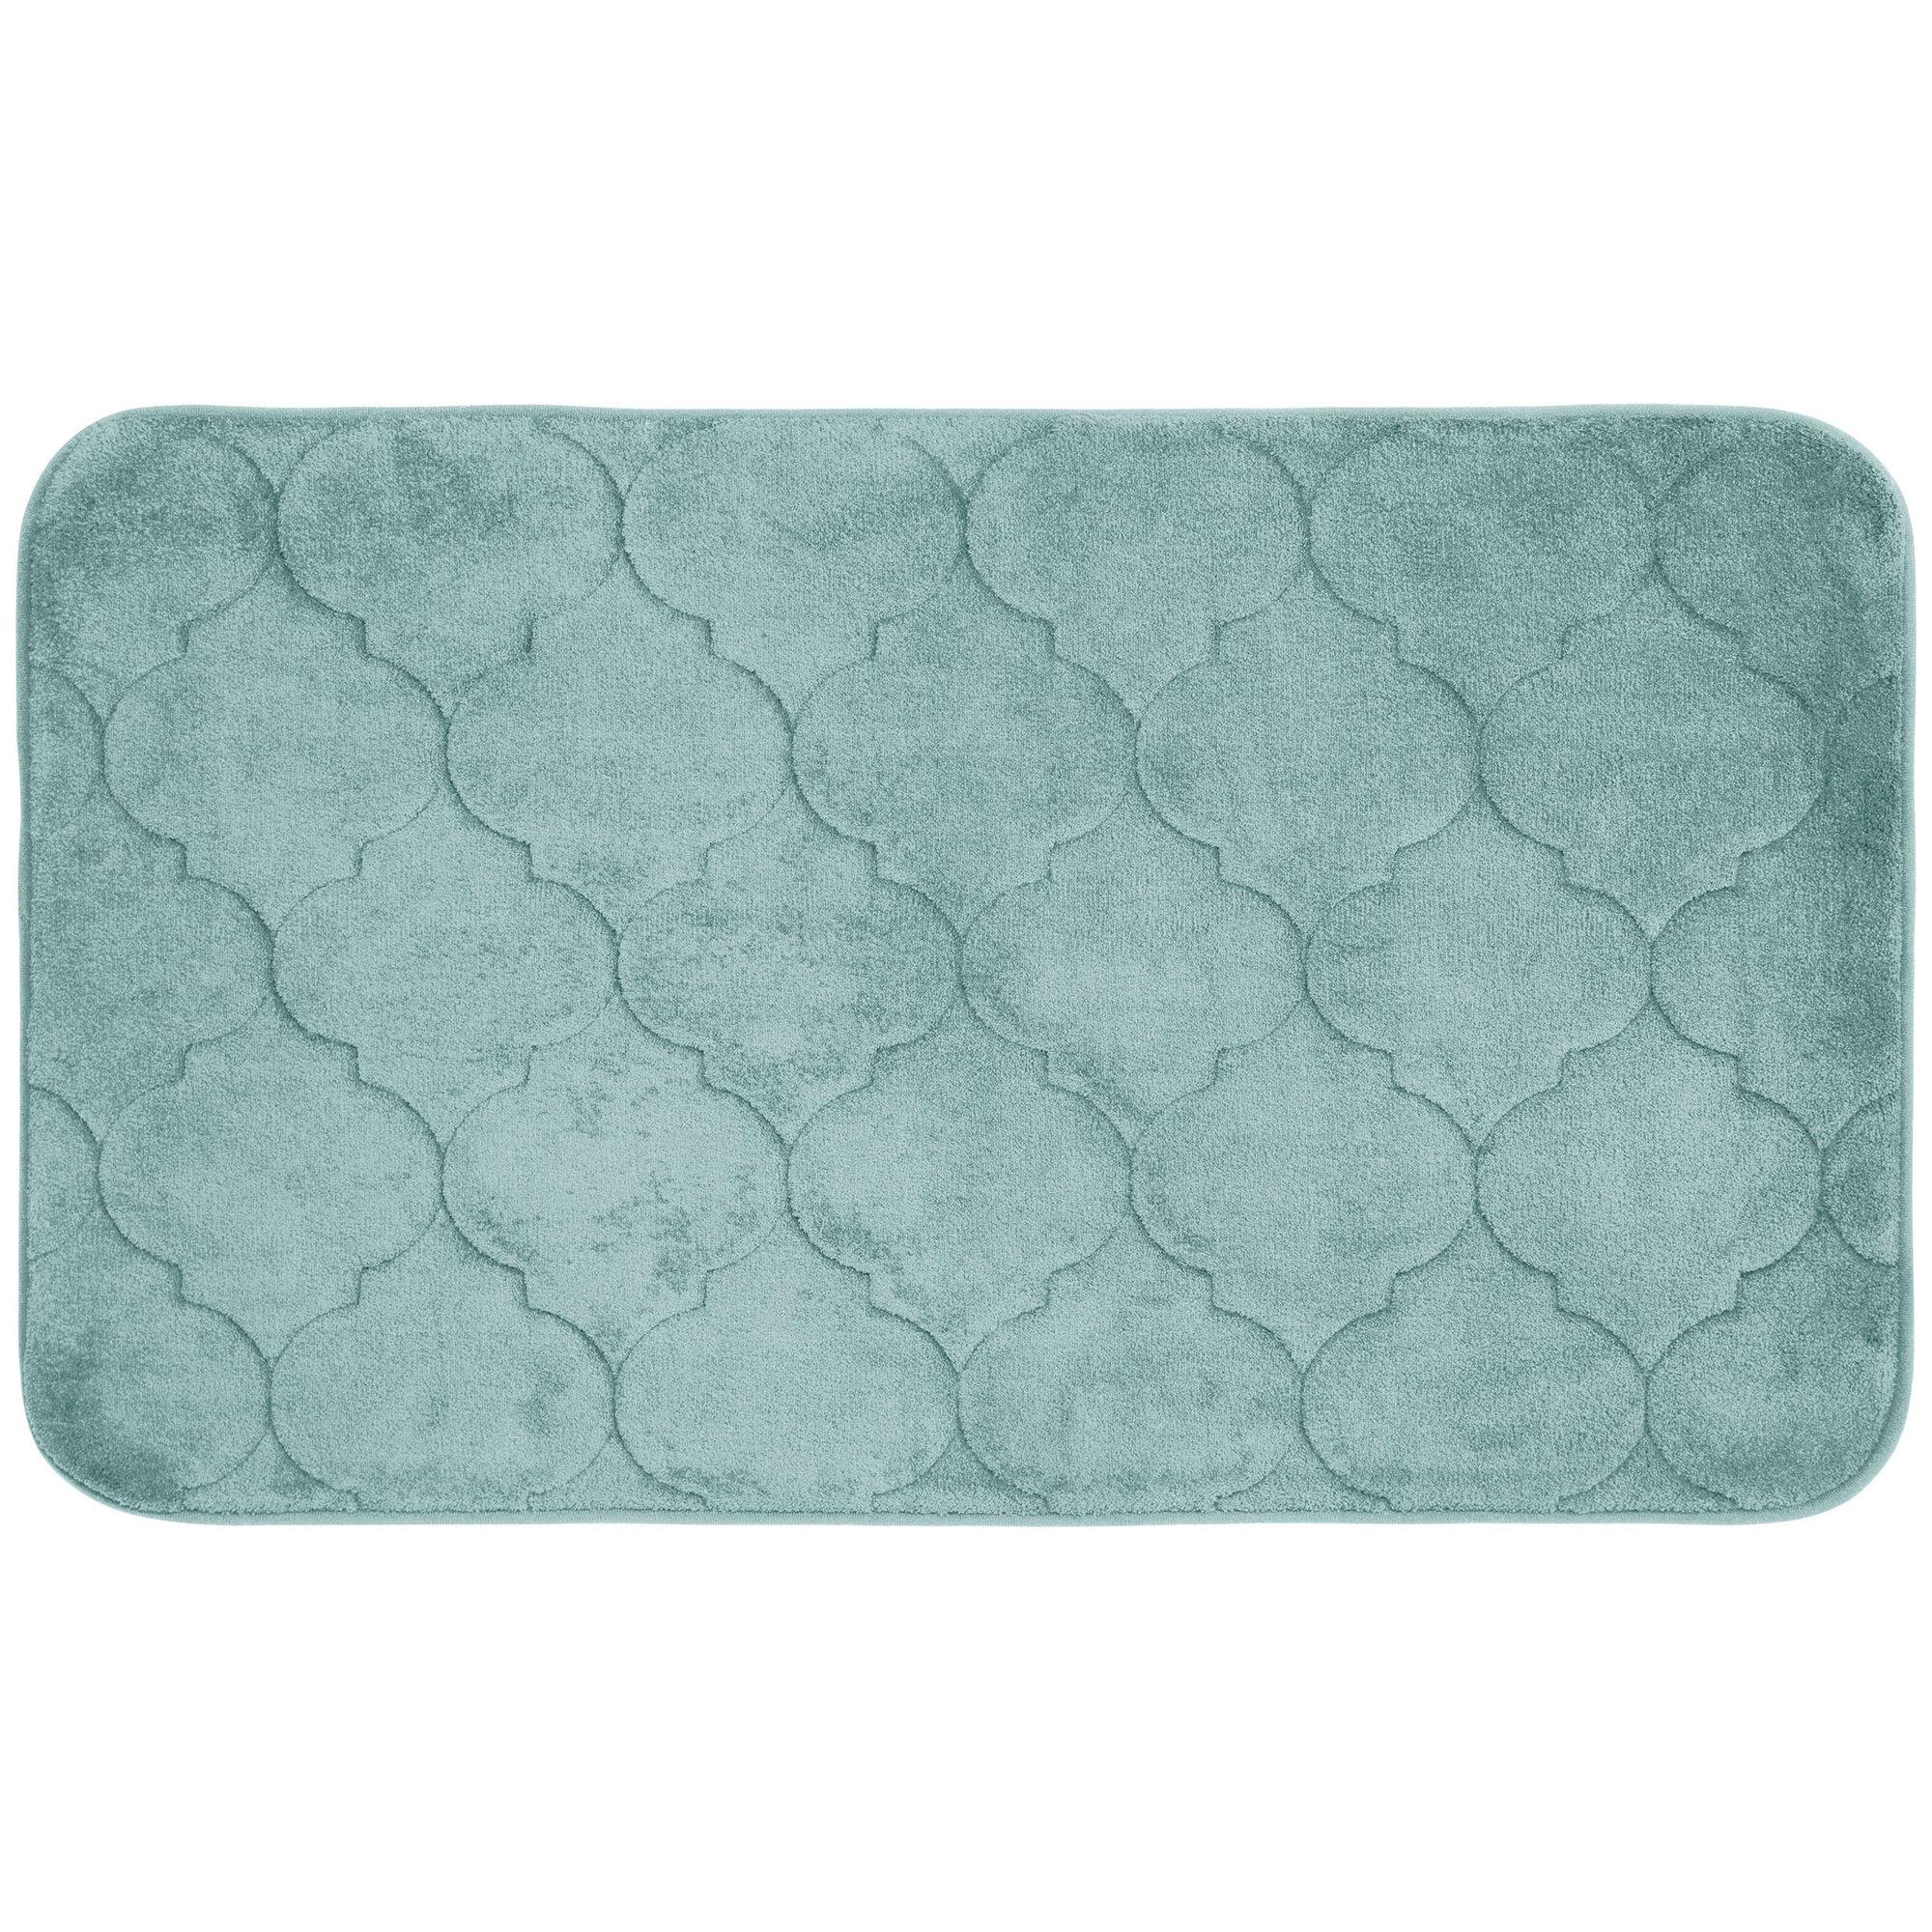 Bath Studio Faymore Micro Plush Memory Foam Bath Mat Color: Aqua, Size: 24